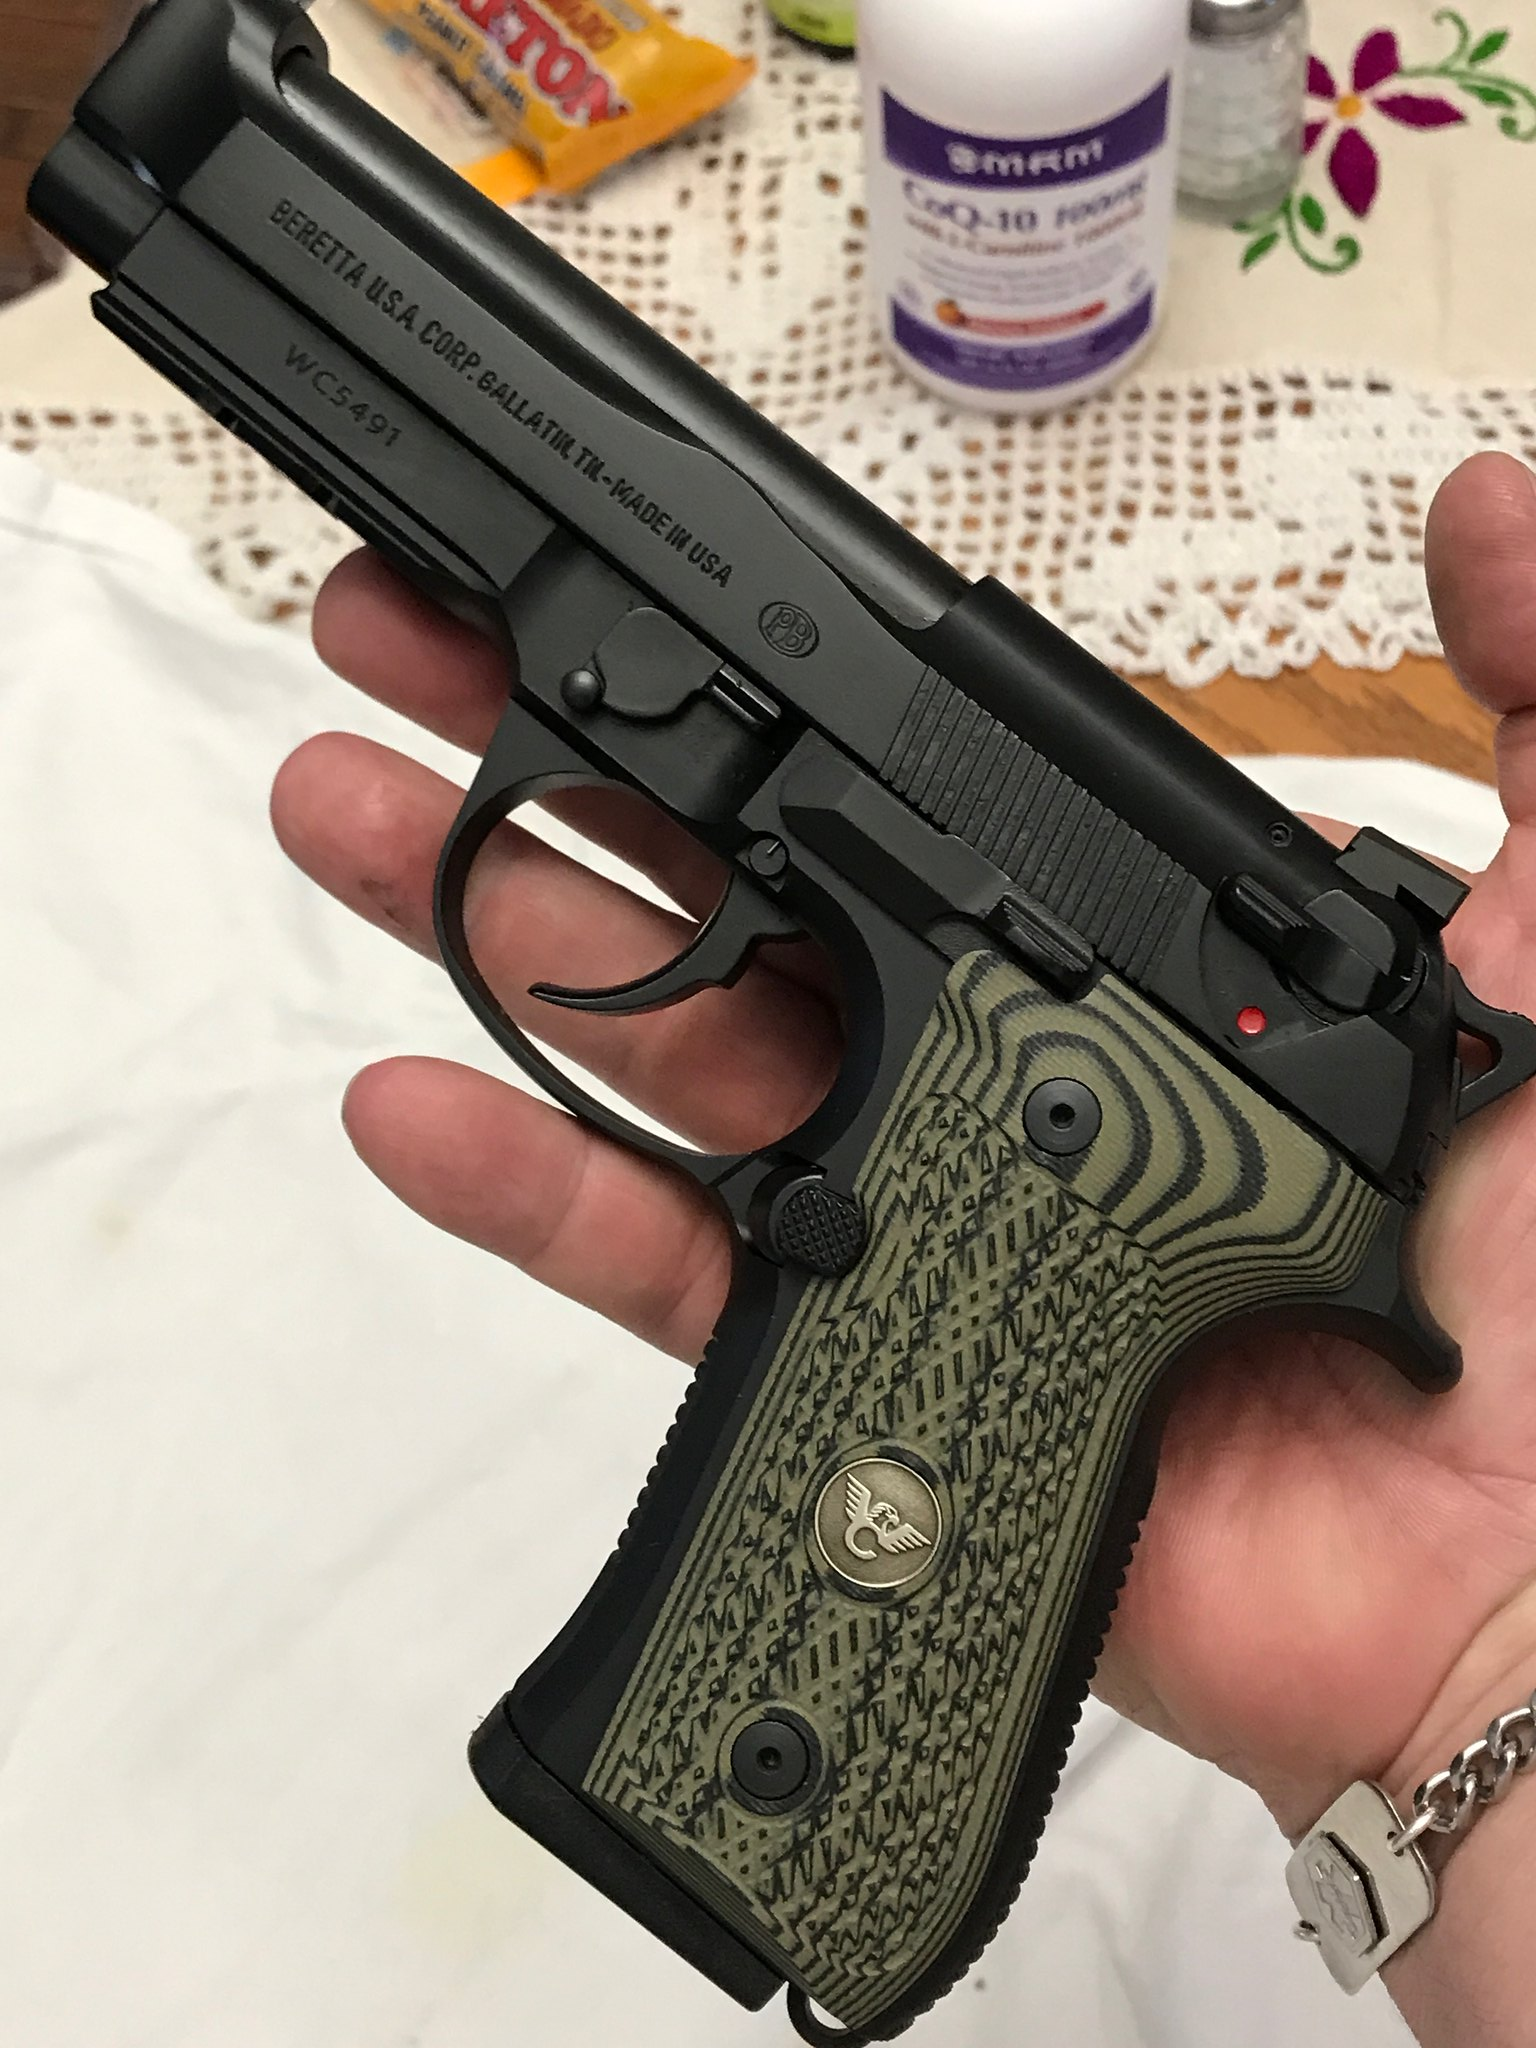 My New Wilson Combat 92G Brig Tac Pistol - Calguns net